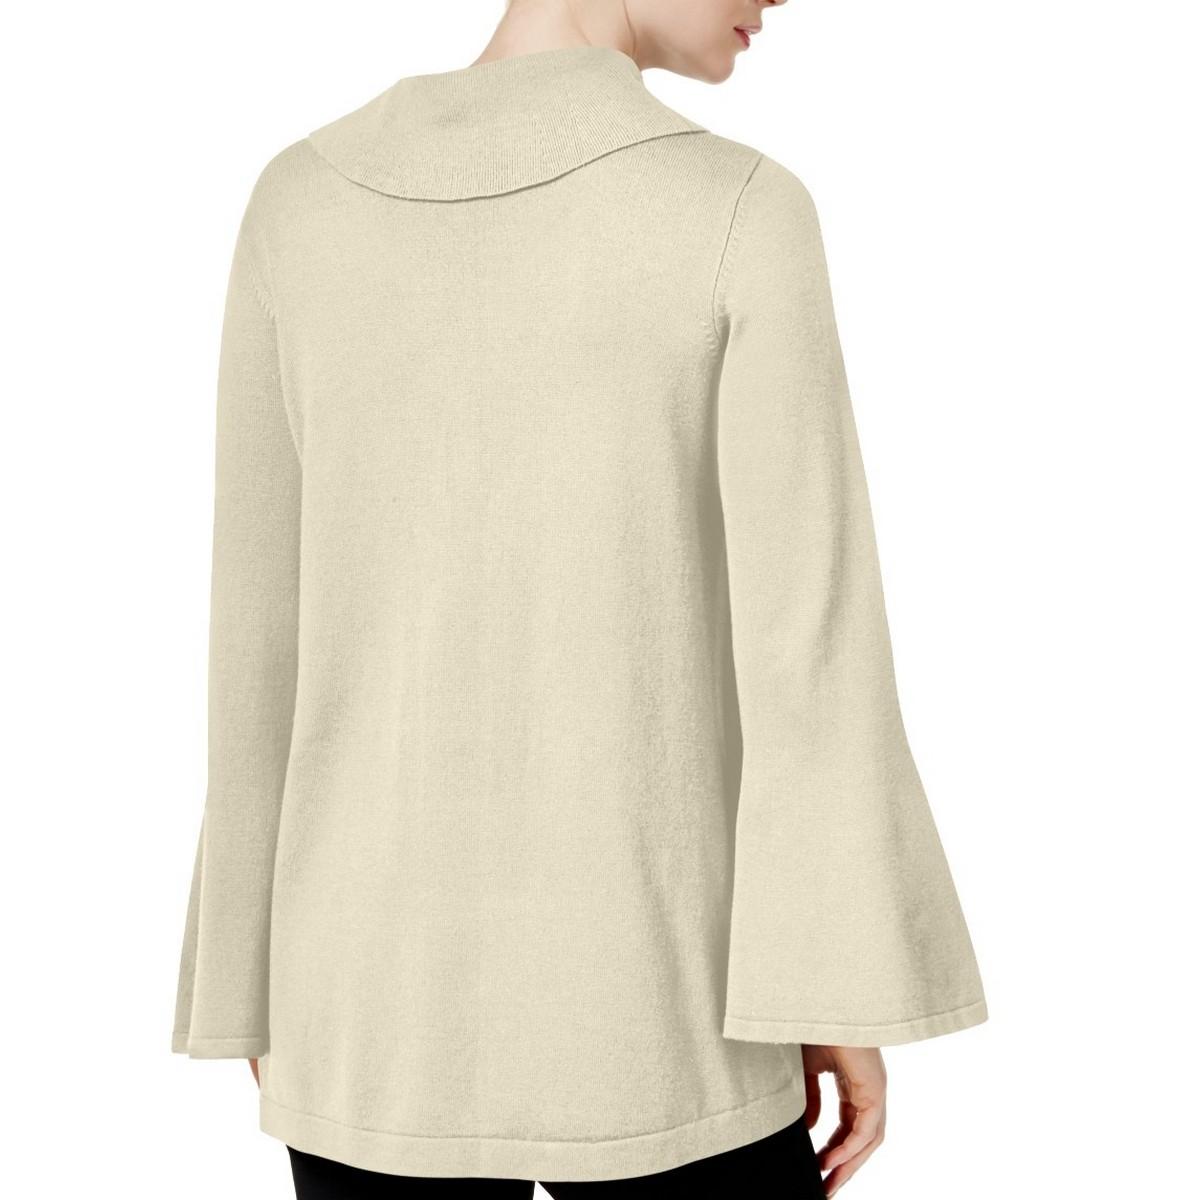 ALFANI-NEW-Women-039-s-Bell-sleeve-Cowl-Neck-Sweater-Top-TEDO thumbnail 4